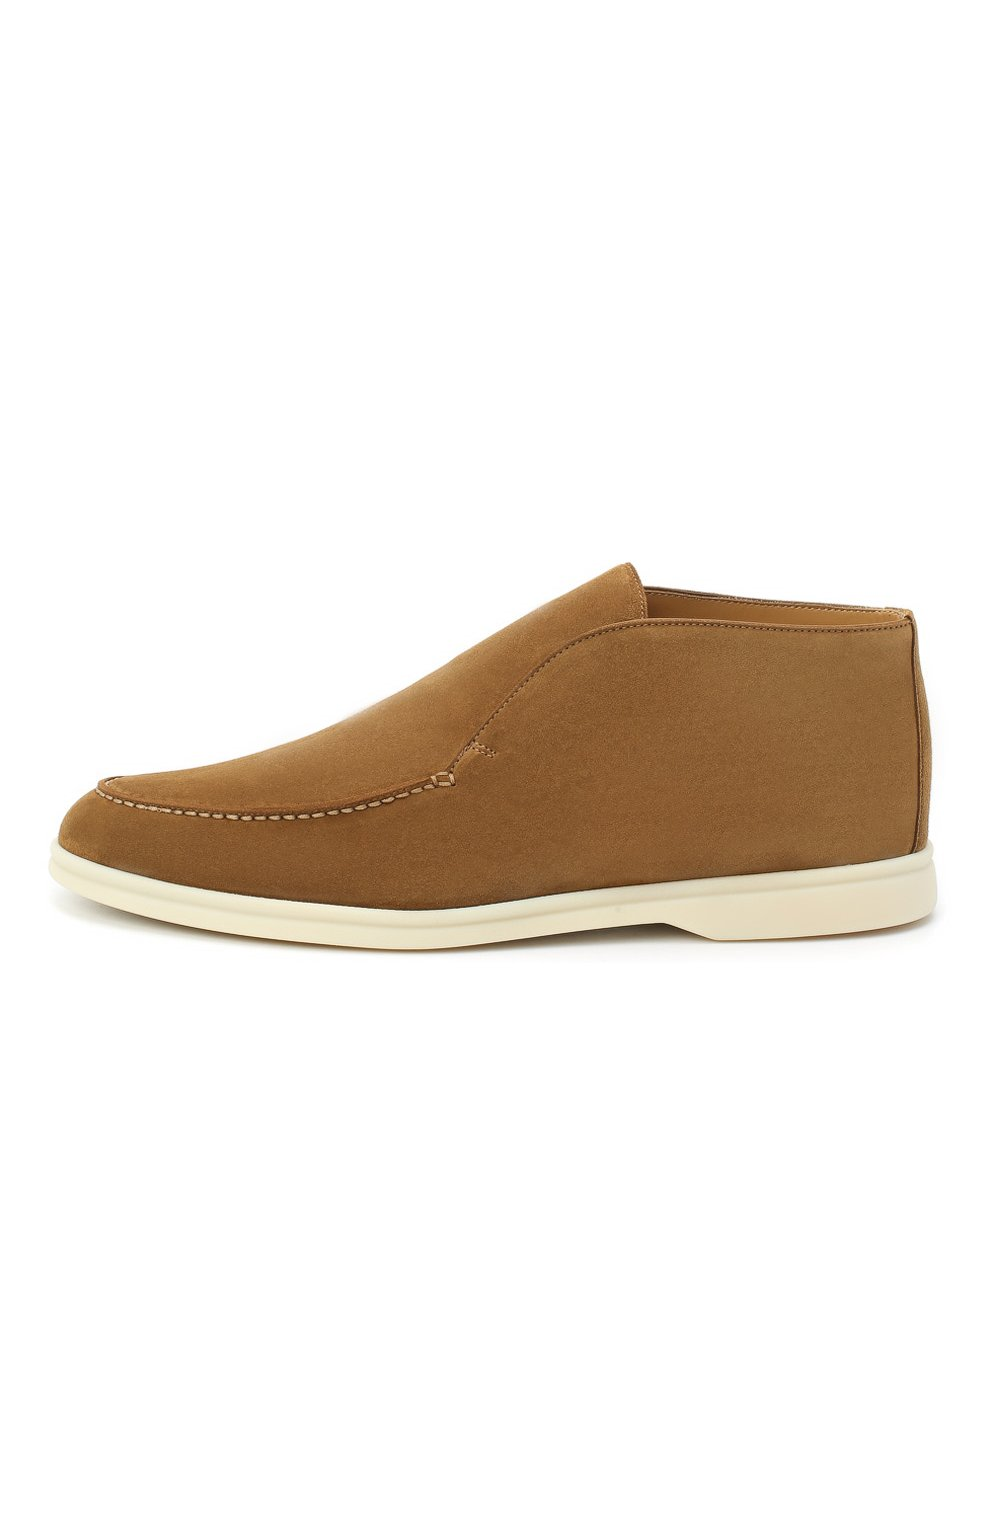 Мужские замшевые ботинки open walk LORO PIANA светло-коричневого цвета, арт. FAB4368 | Фото 3